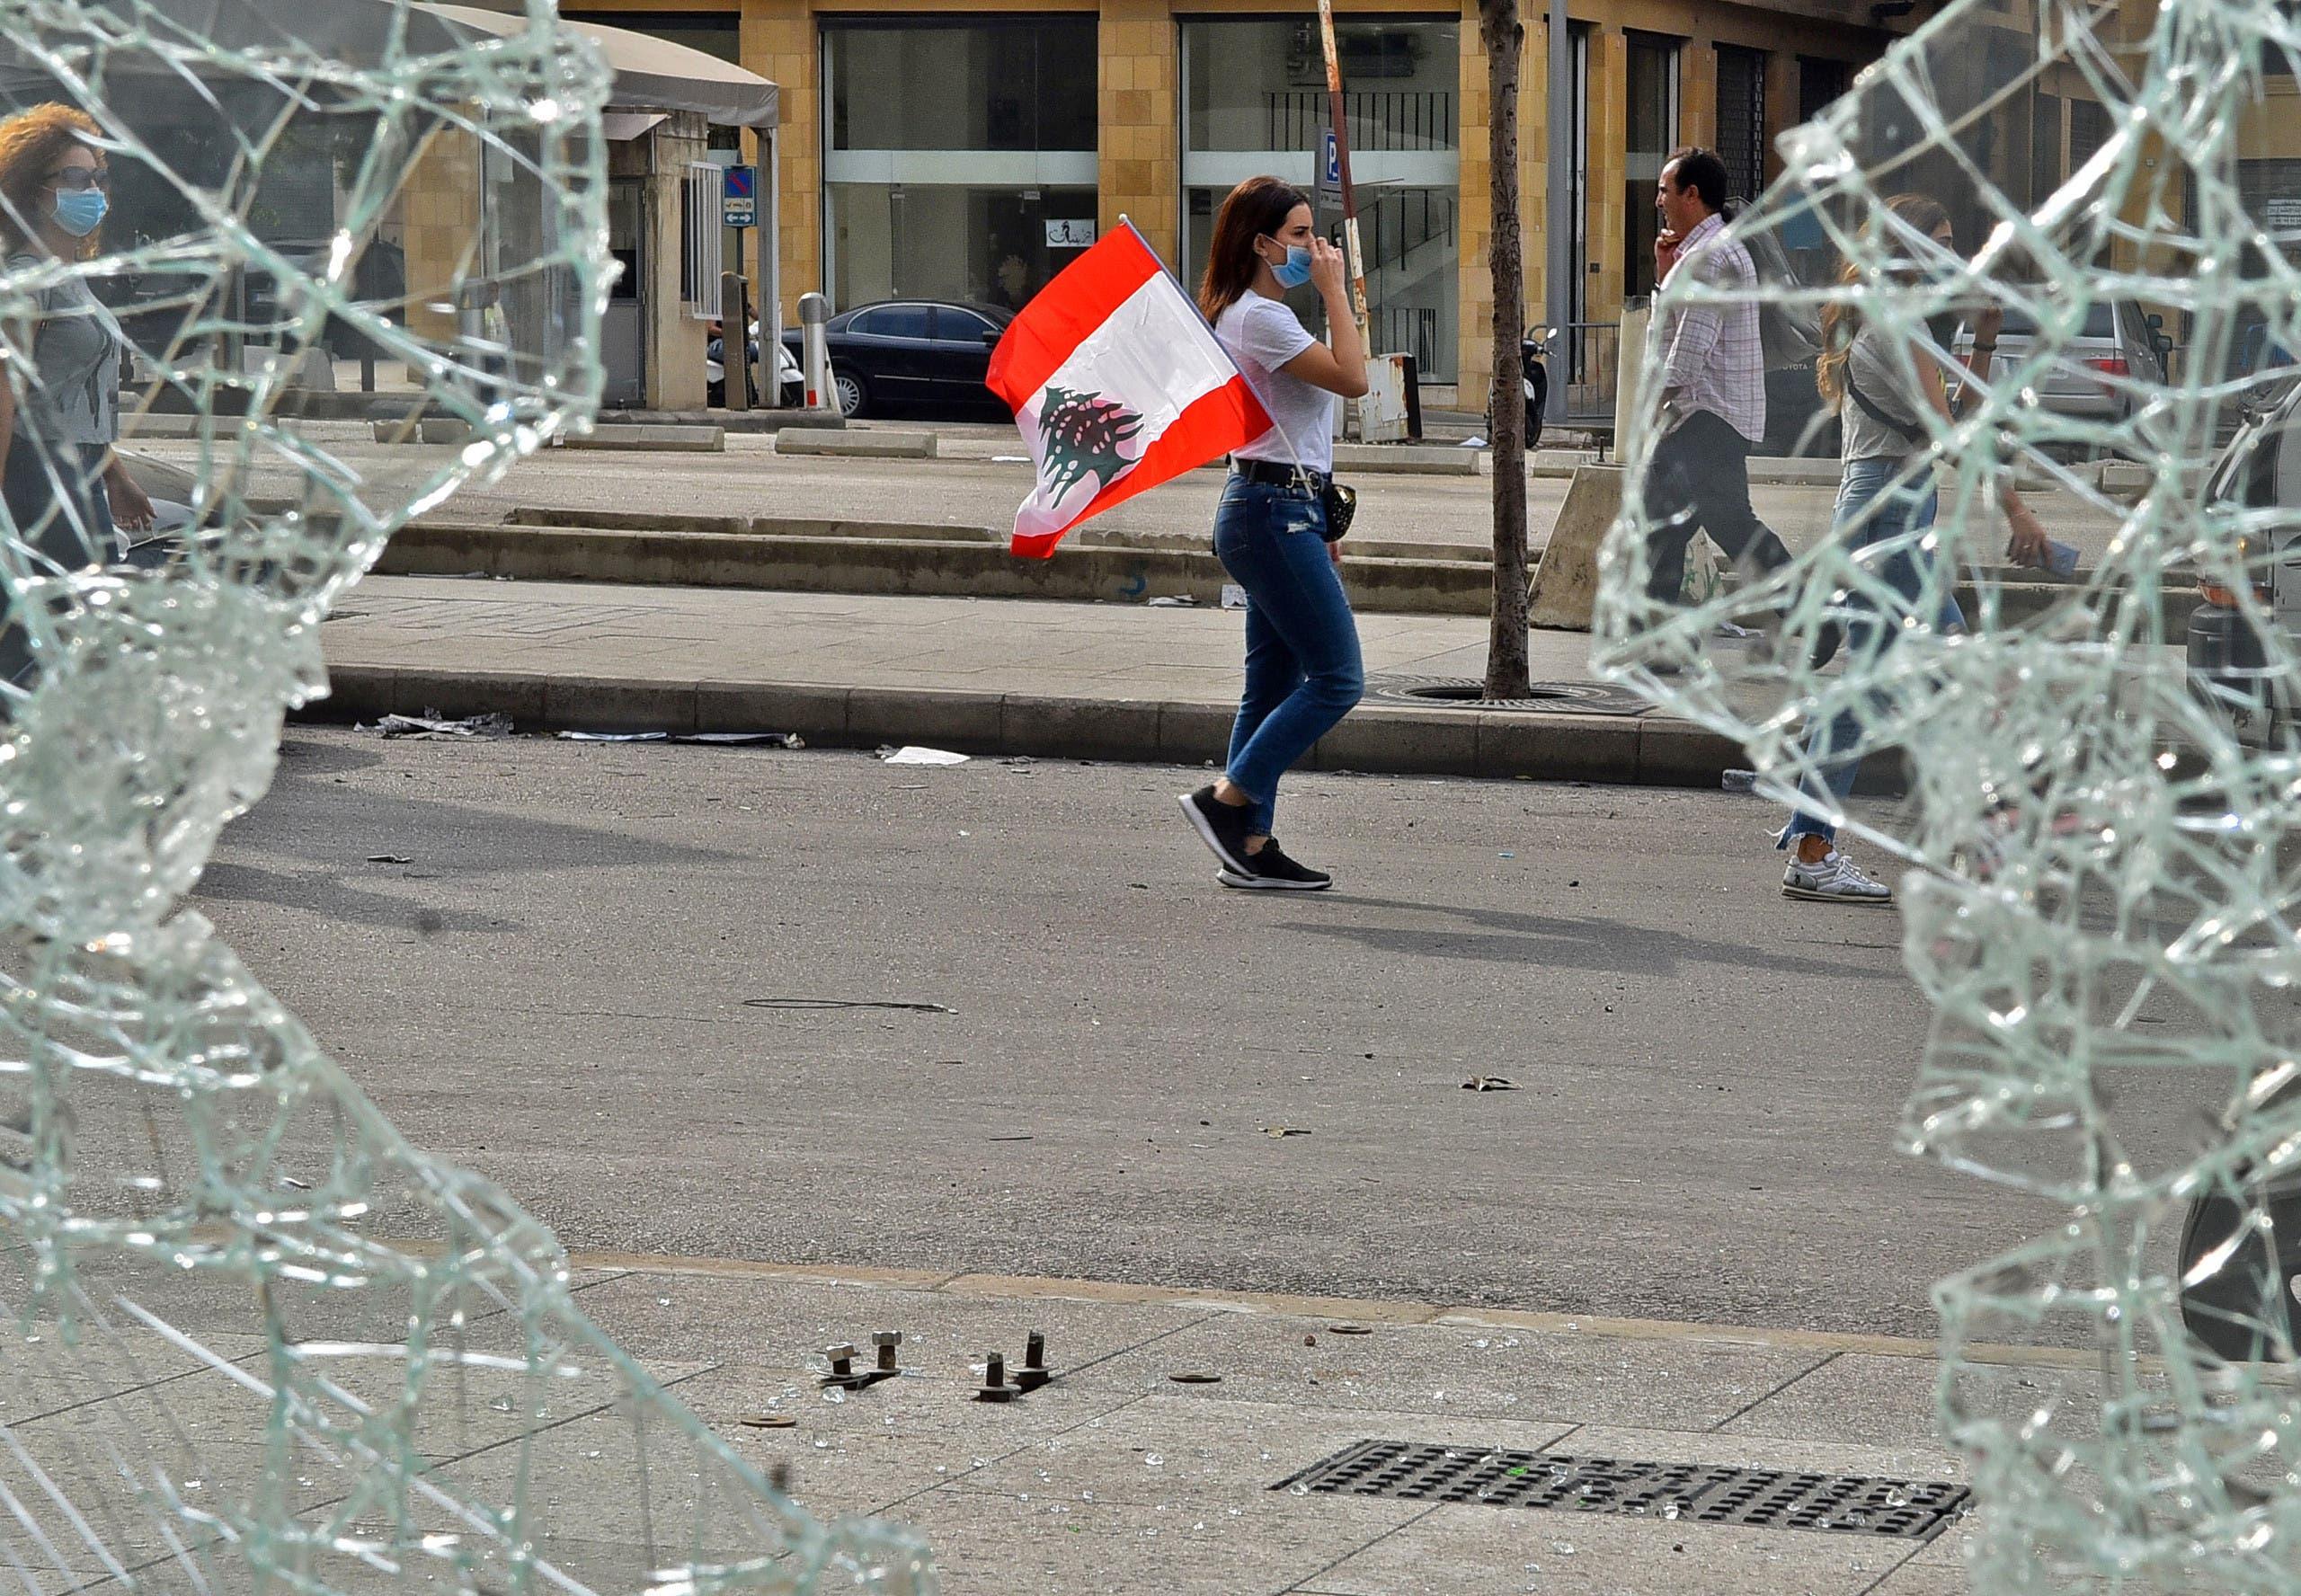 مظاهرات لبنان 18 أكتوبر، فرانس برس